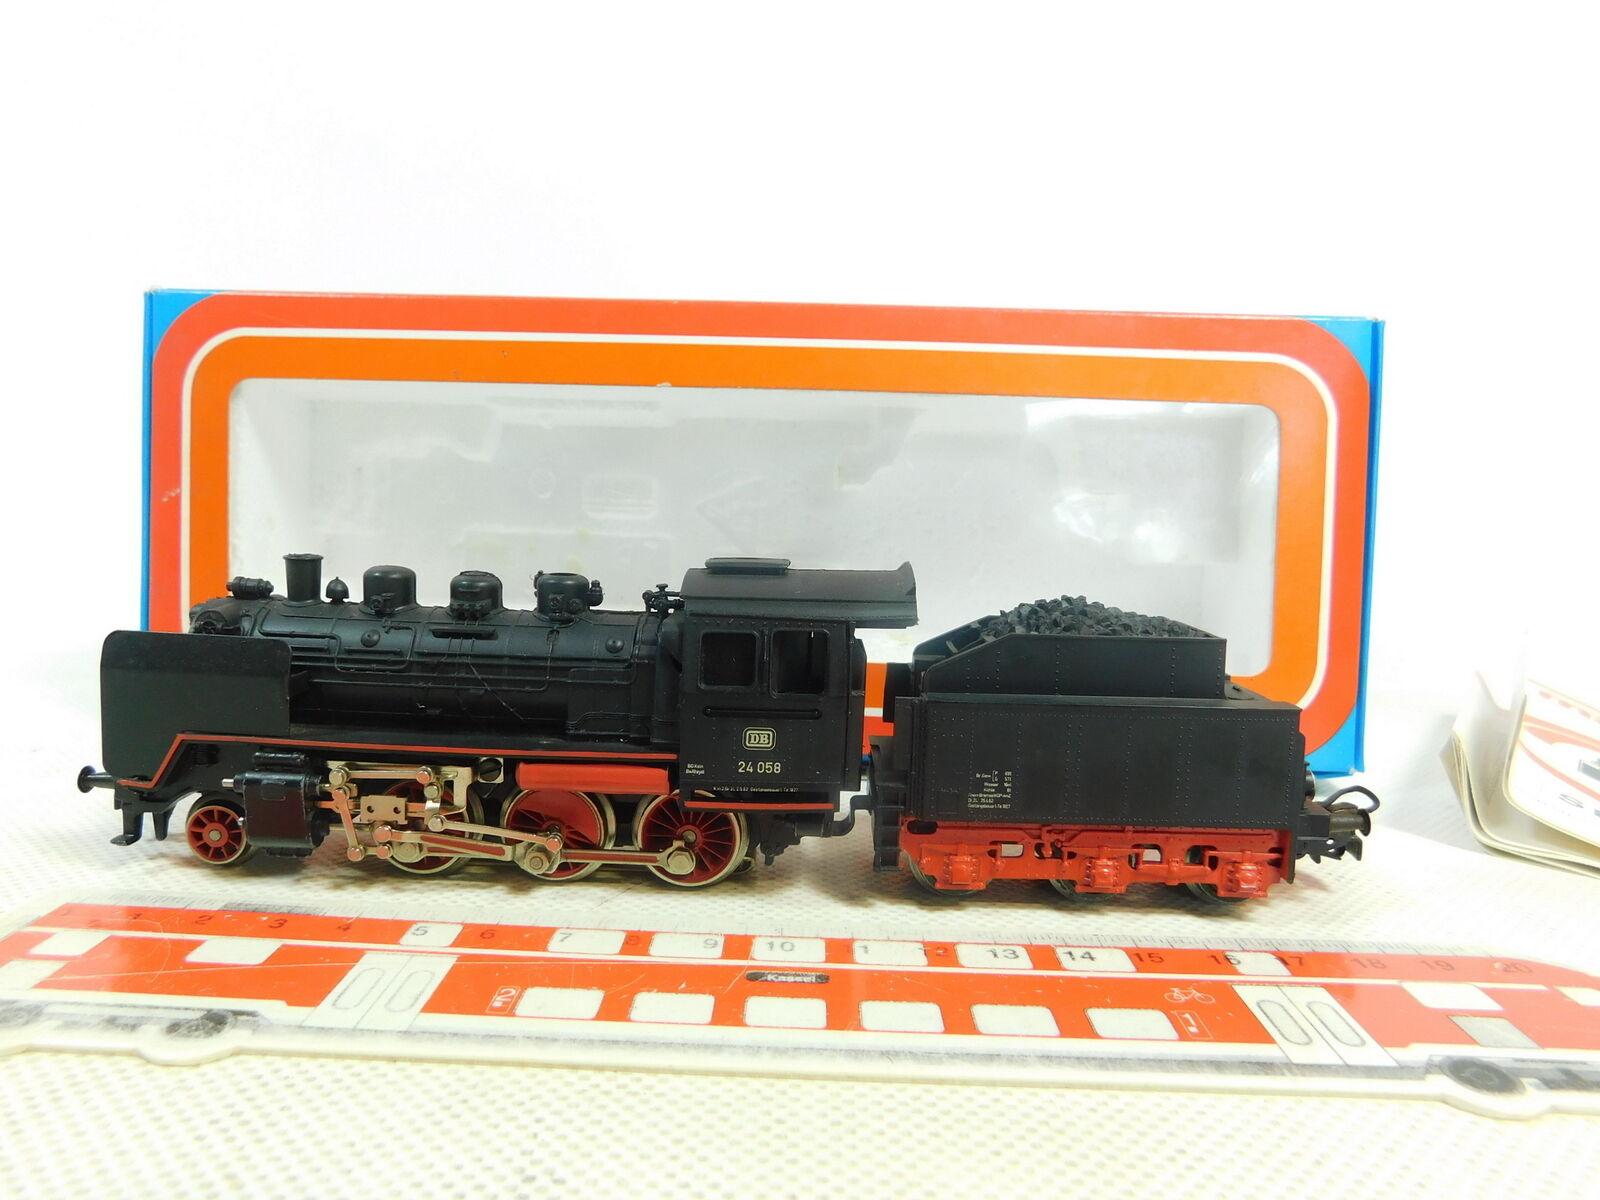 BT35-1  Märklin H0 AC 3003 Dampflok Dampflokomotive 24 058 DB, sehr gut+OVP